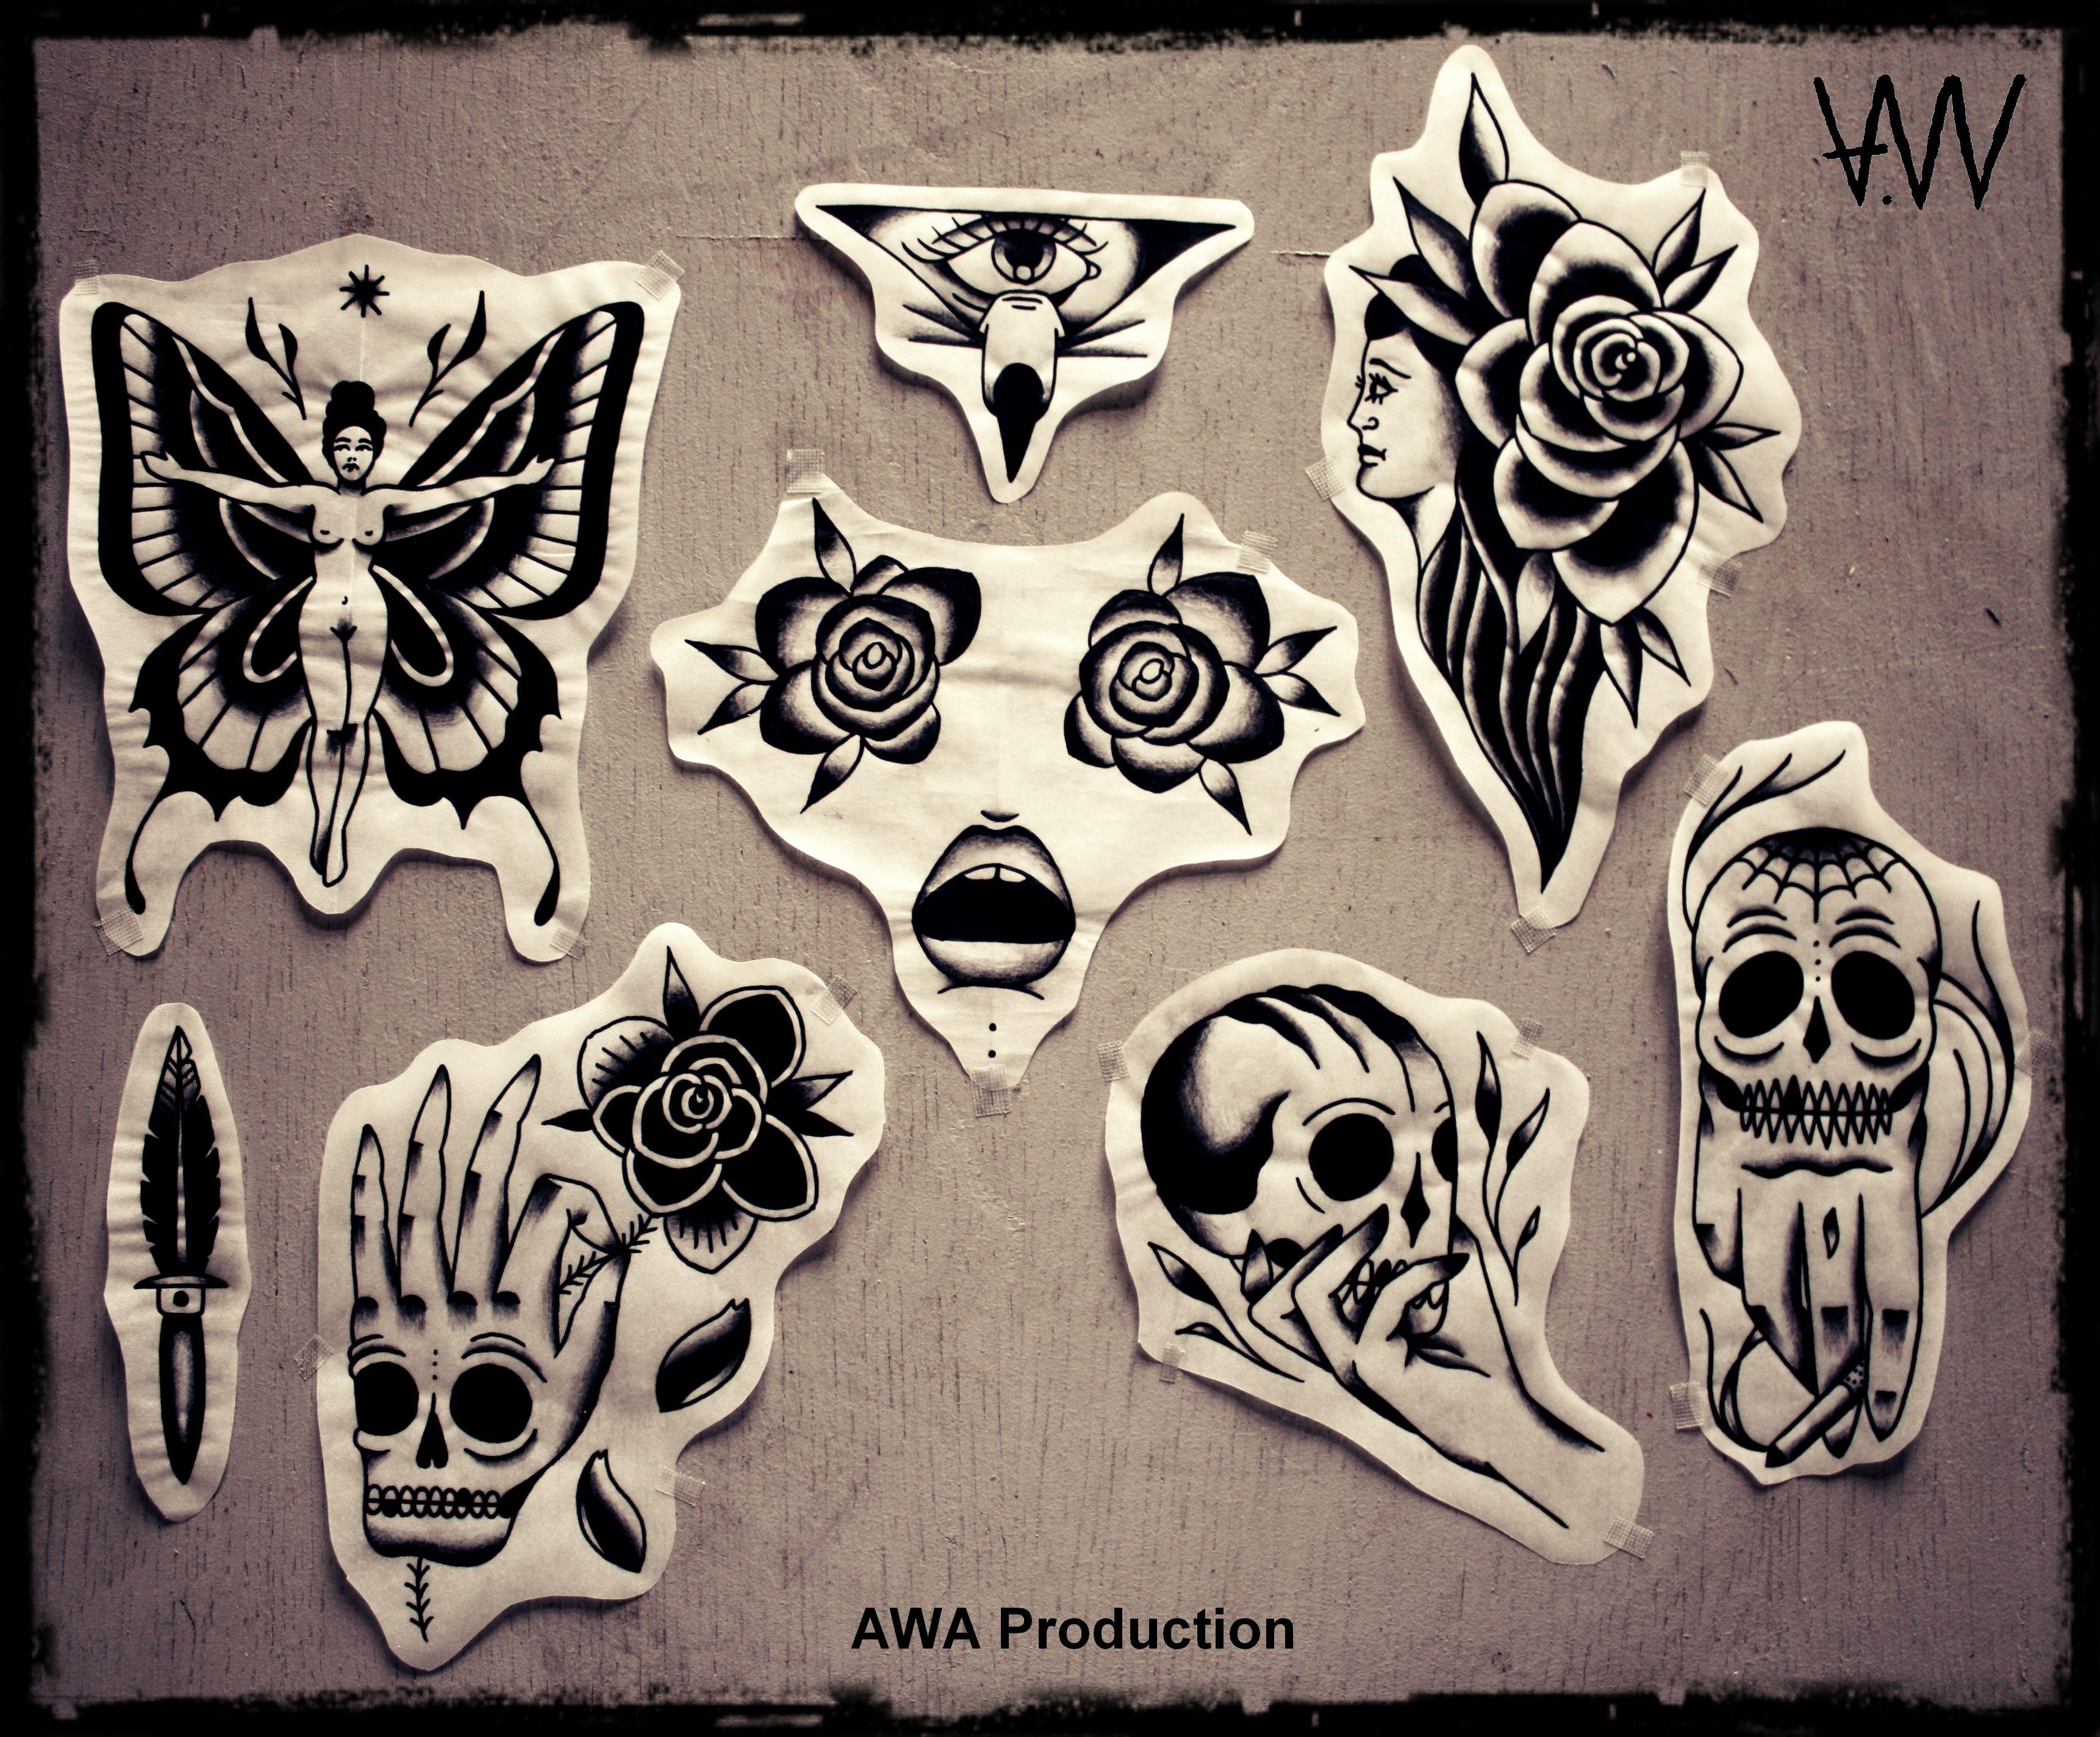 Tattoo Flash Art Black And White Guitar: AWA Production Black Traditional Tattoo Flash.